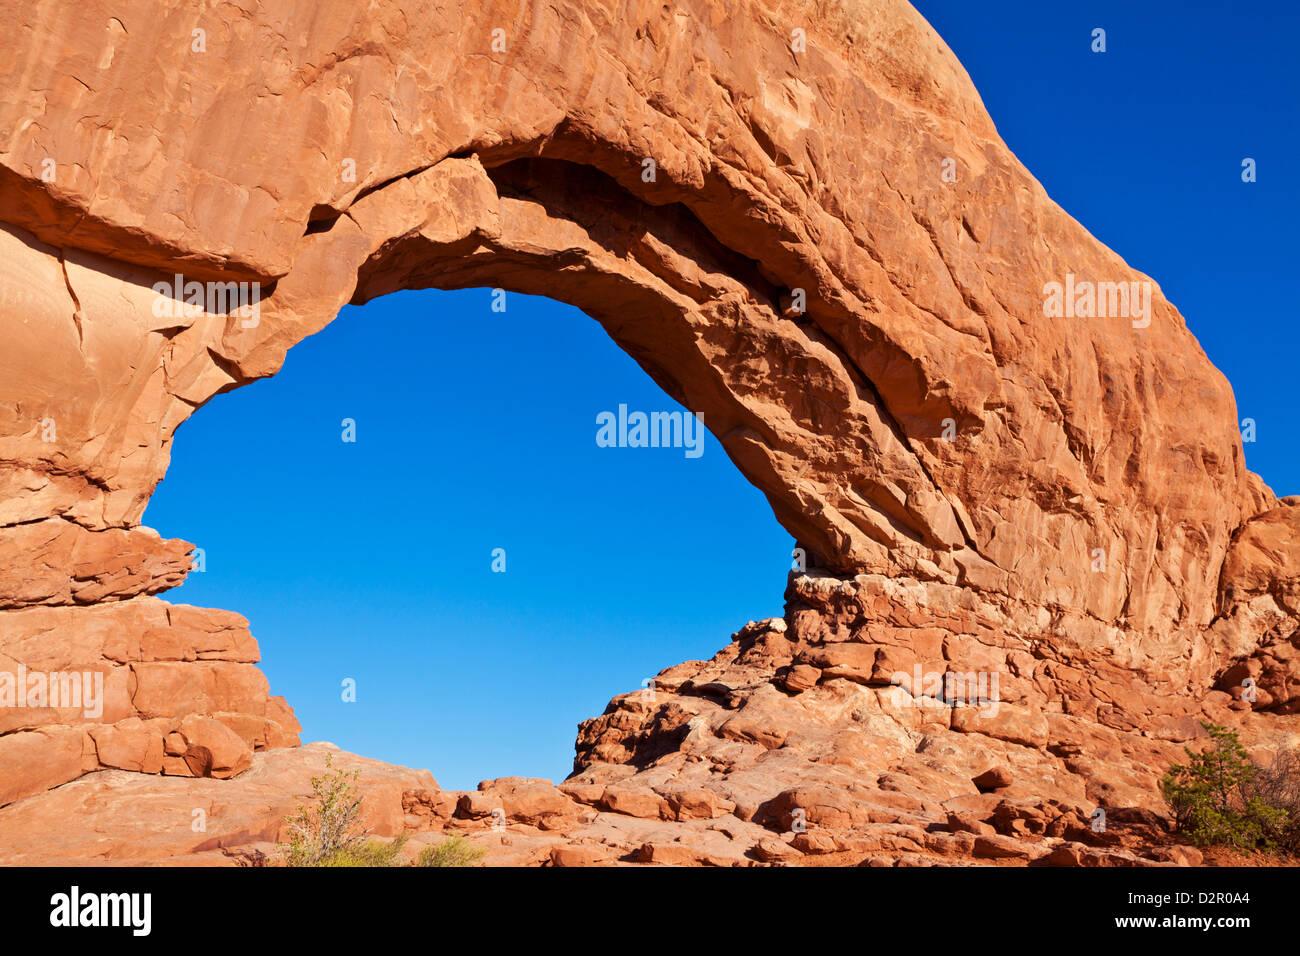 Ventana norte Arch Arches National Park, cerca de Moab, Utah, Estados Unidos de América, América del Norte Imagen De Stock